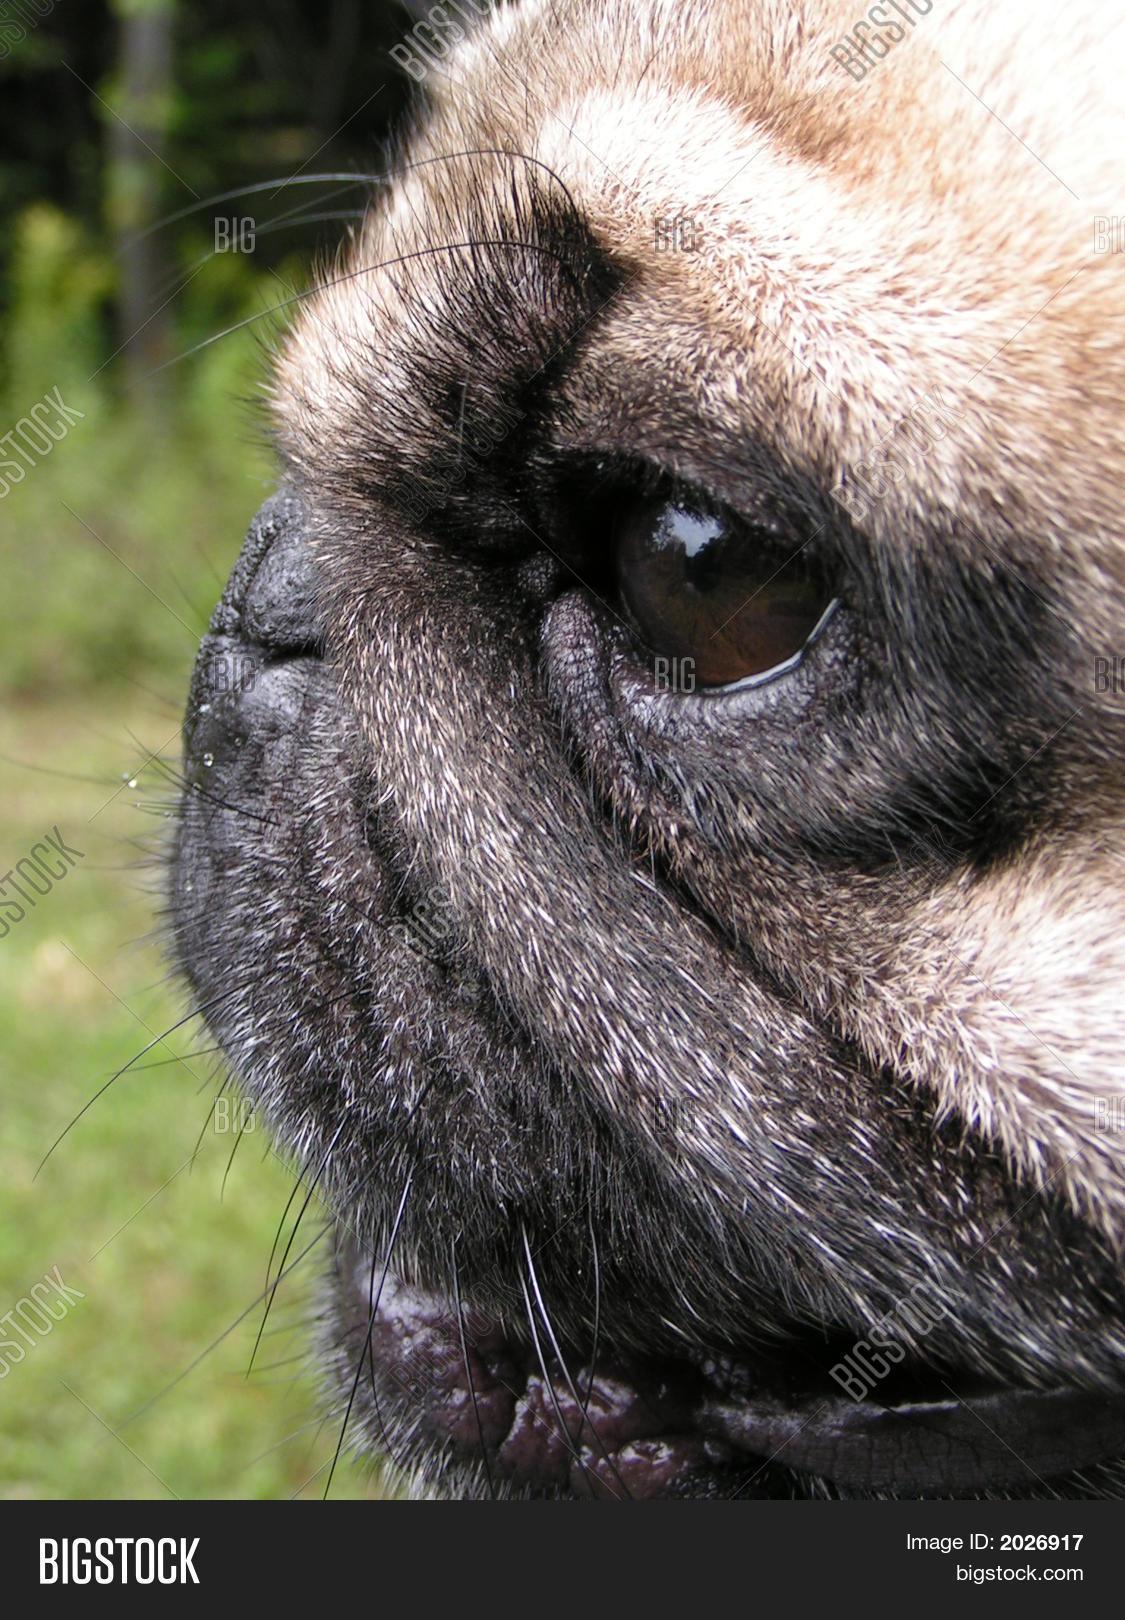 close up side view pug dog face stock photo stock images bigstock. Black Bedroom Furniture Sets. Home Design Ideas